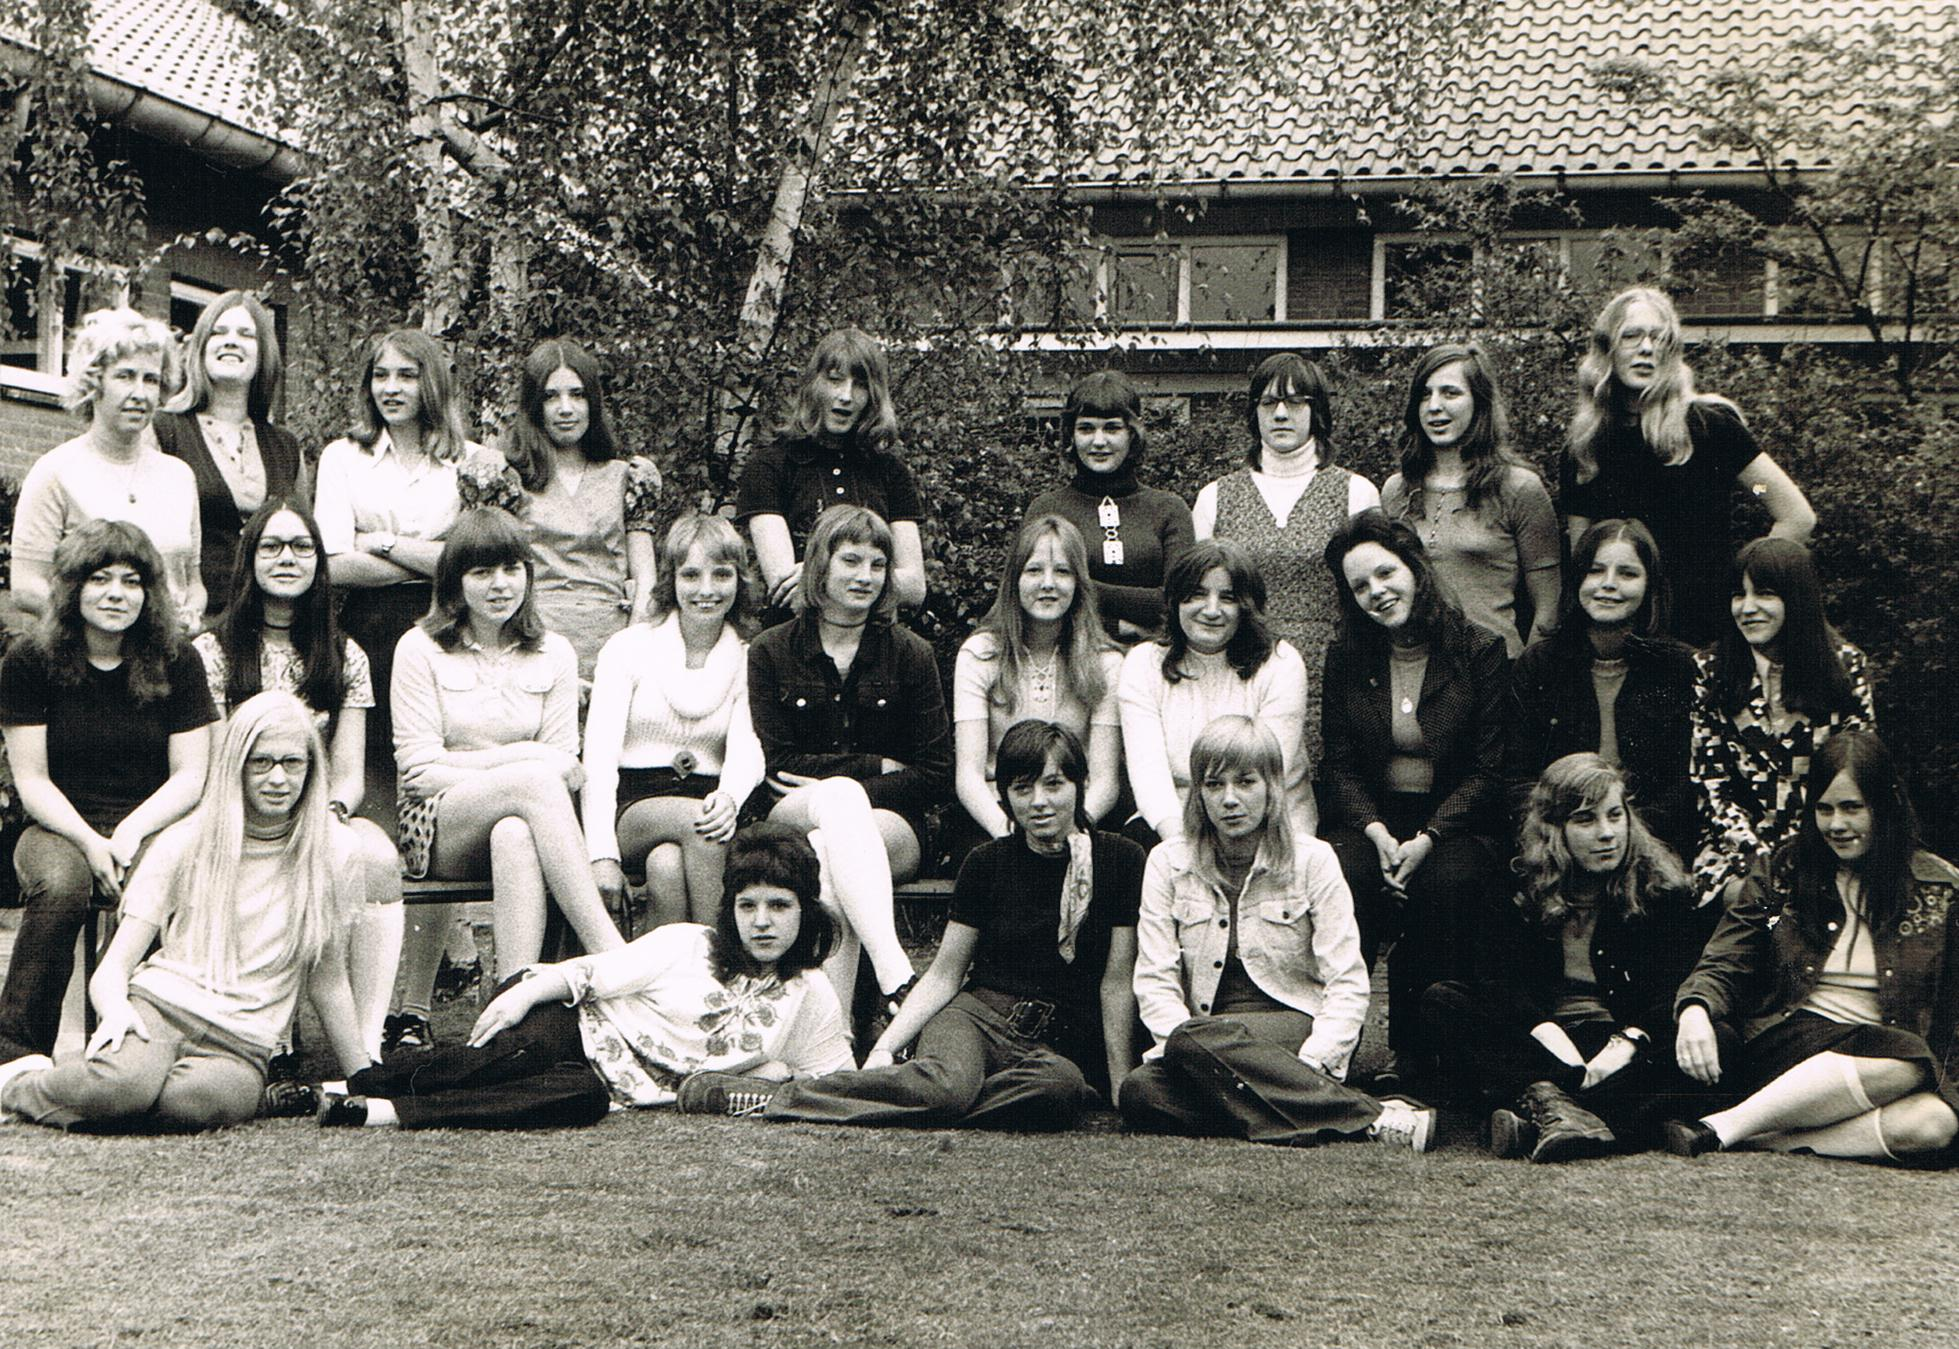 Amstelveense Huishoudschool foto